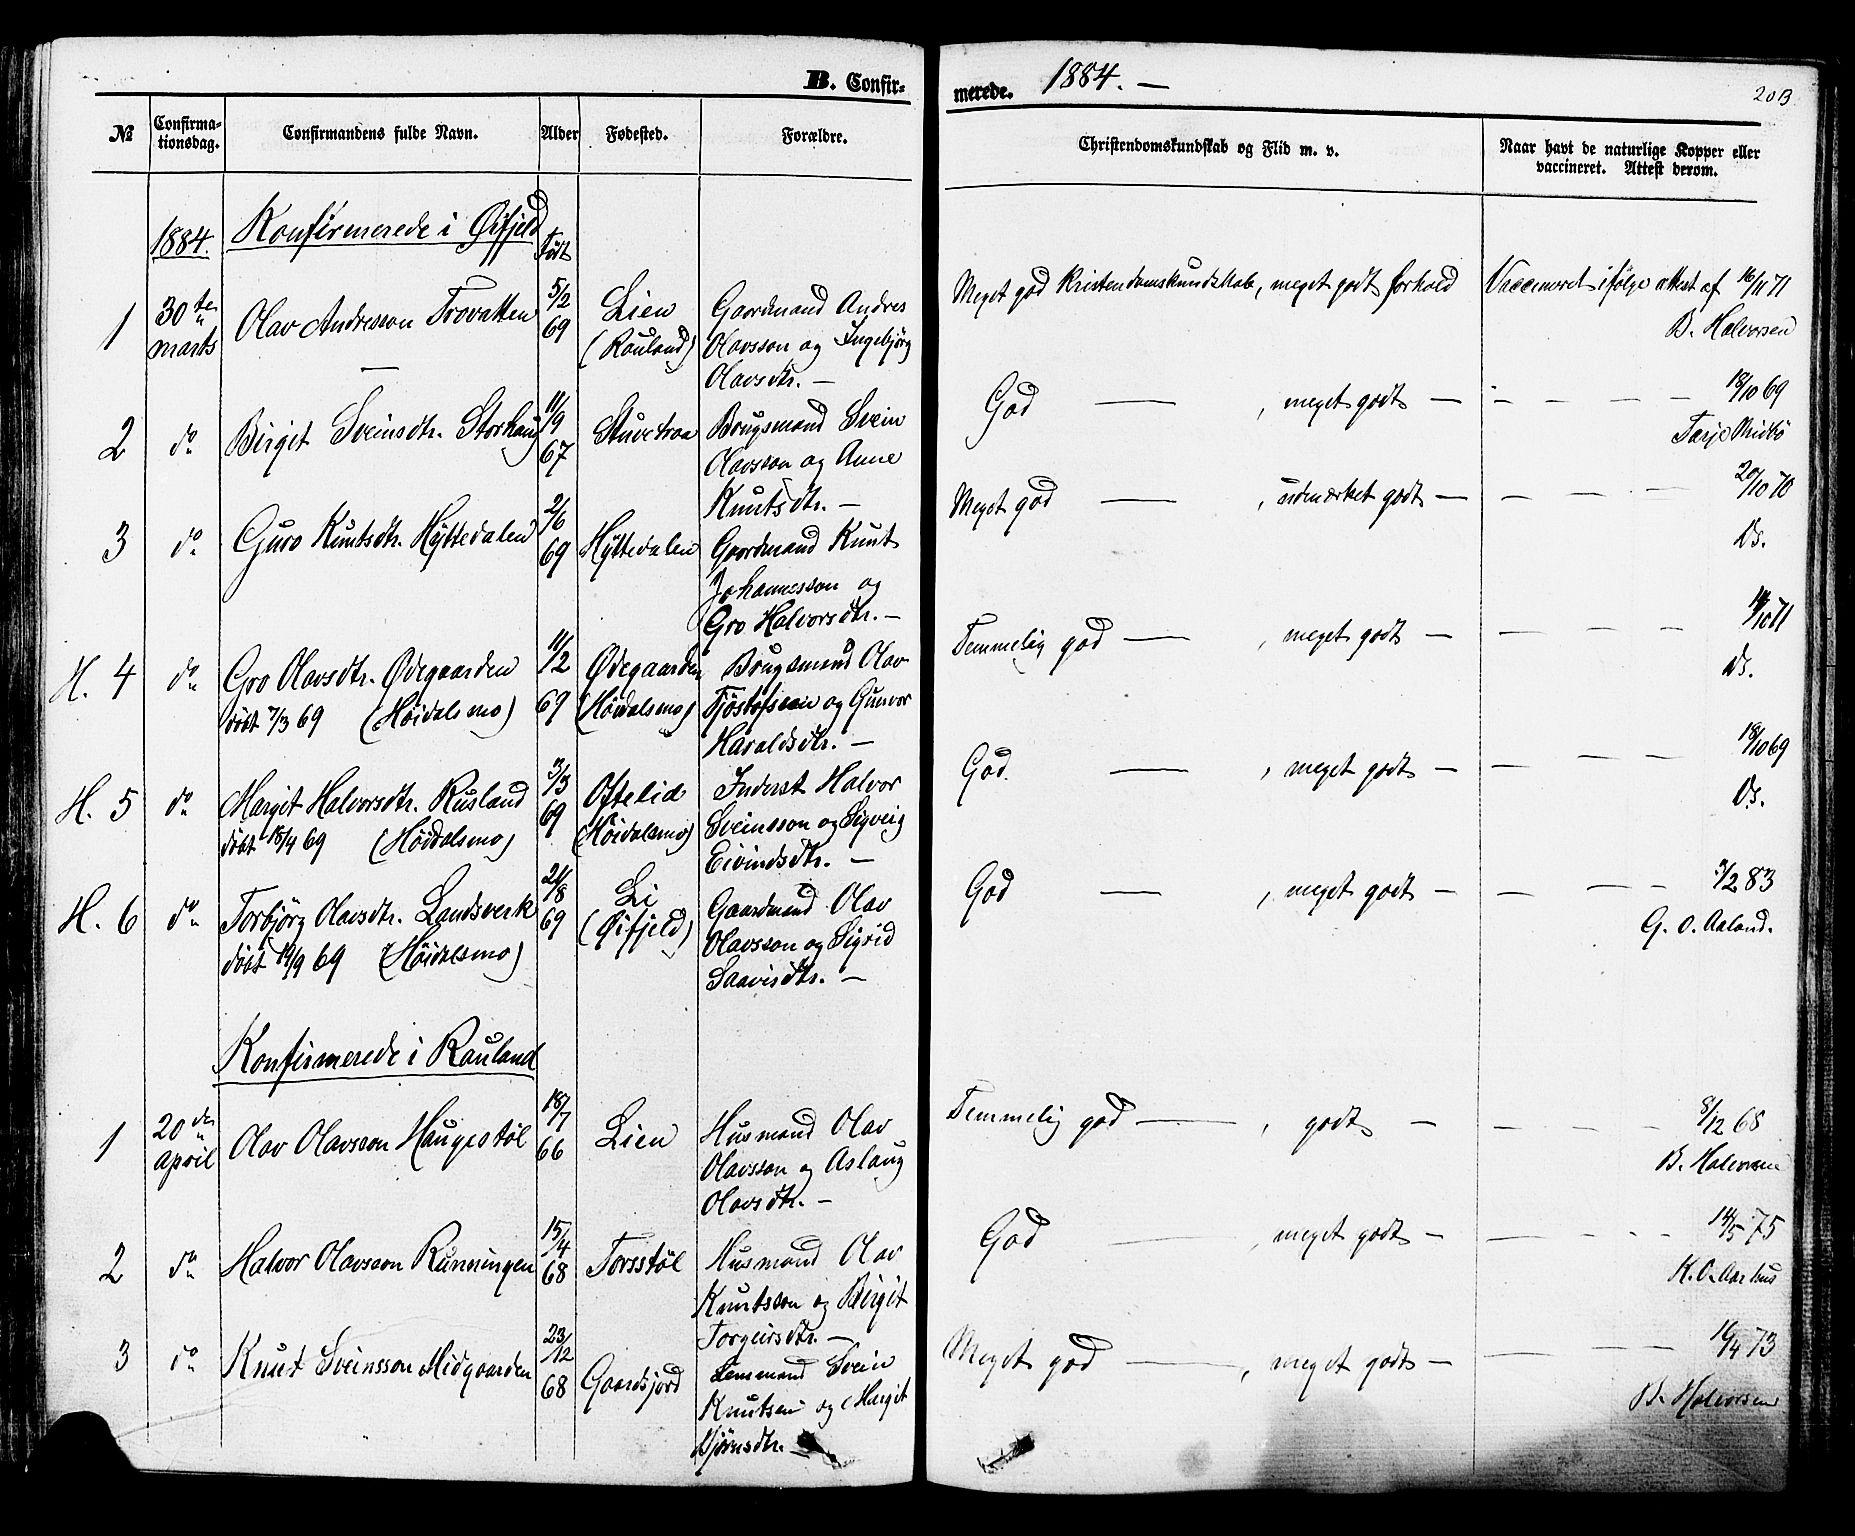 SAKO, Rauland kirkebøker, F/Fa/L0003: Ministerialbok nr. 3, 1859-1886, s. 203